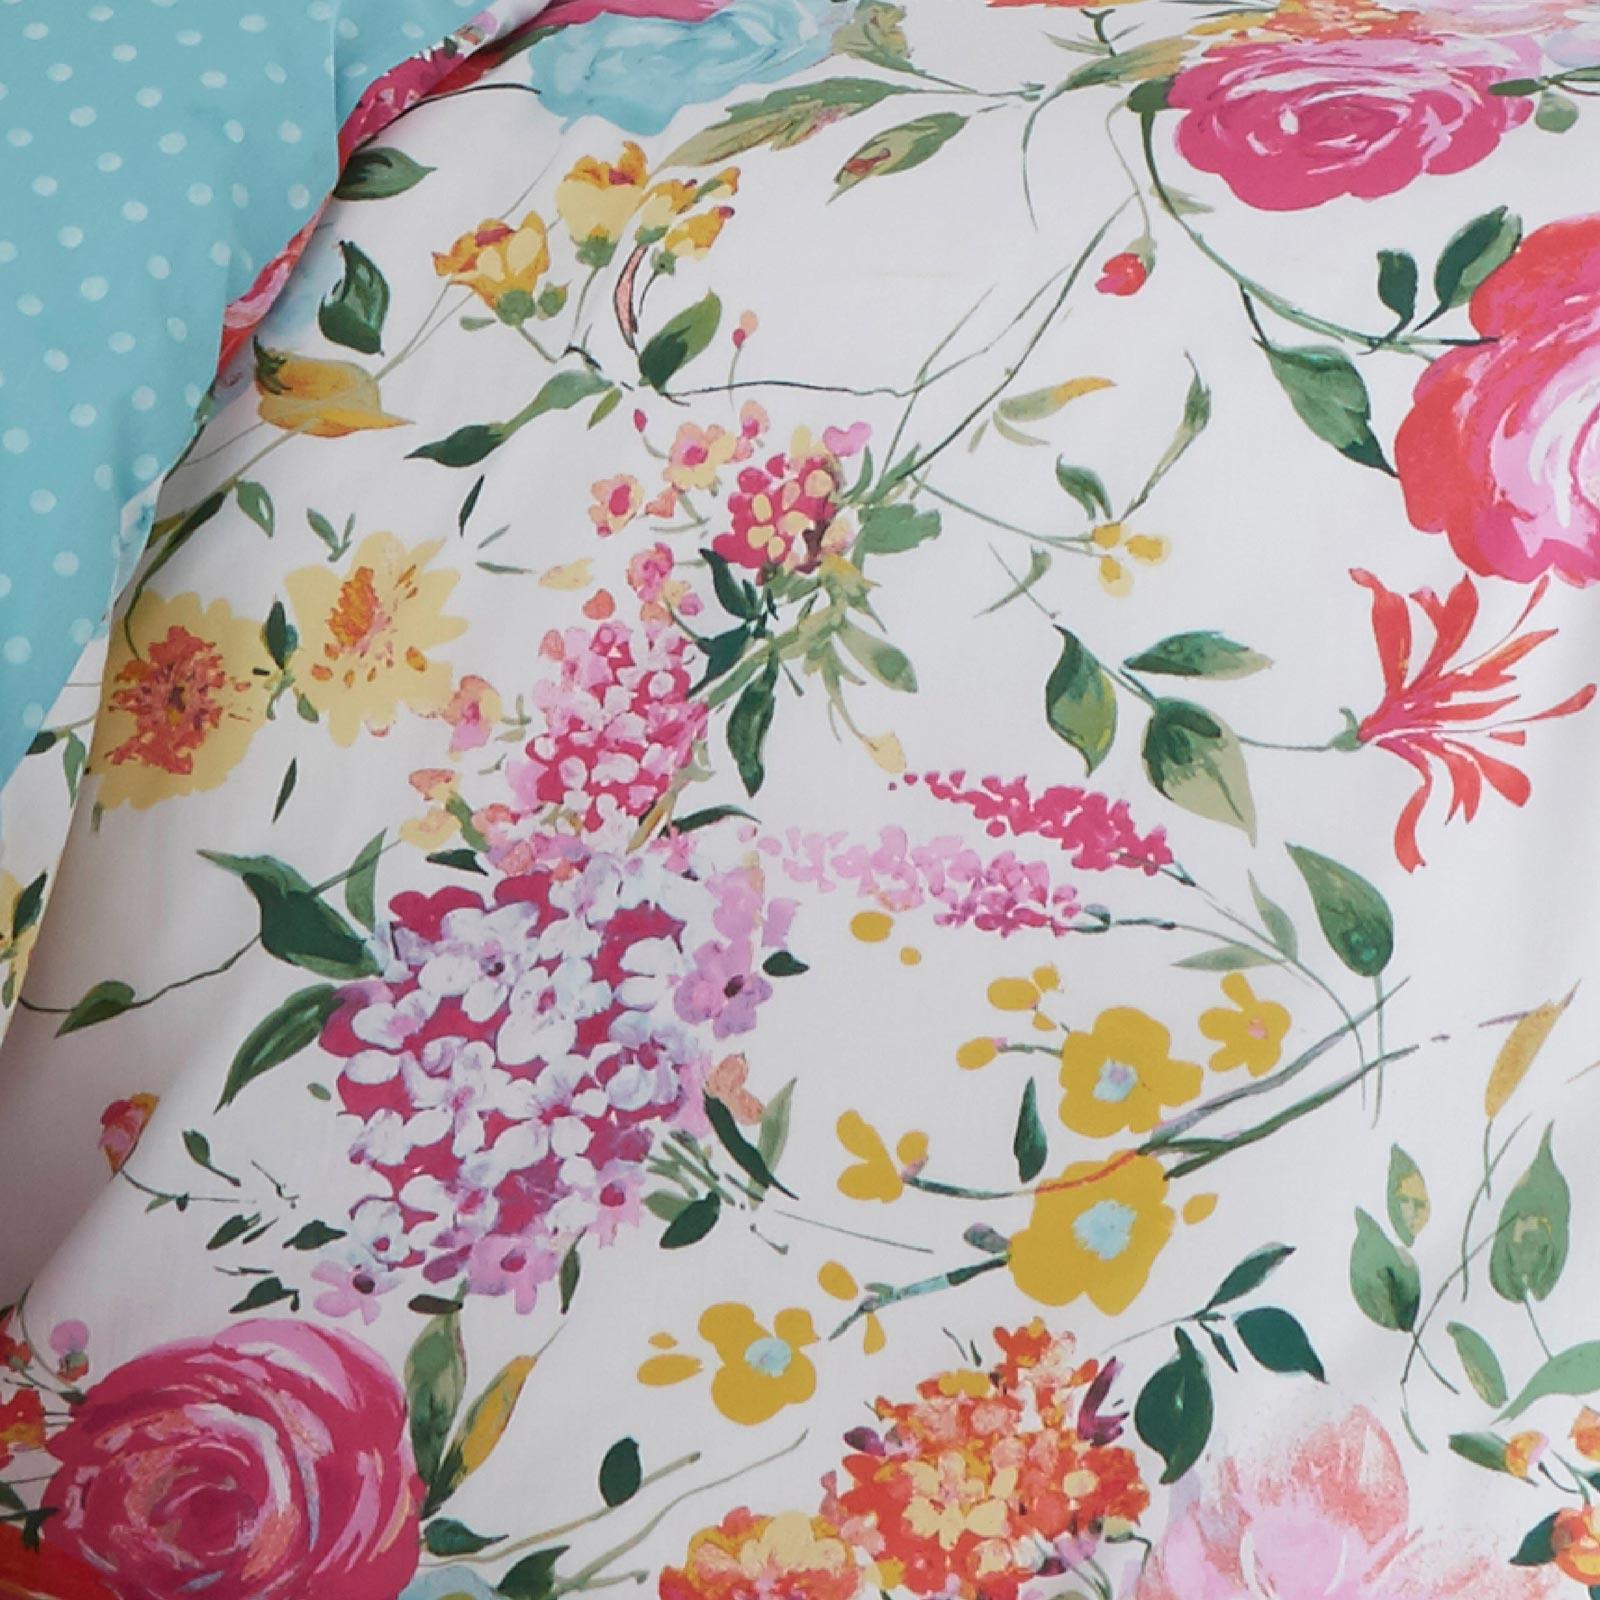 Catherine-Lansfield-Salisbury-Pink-cubierta-del-edredon-edredon-cubre-floral-de-conjuntos-de-cama miniatura 13